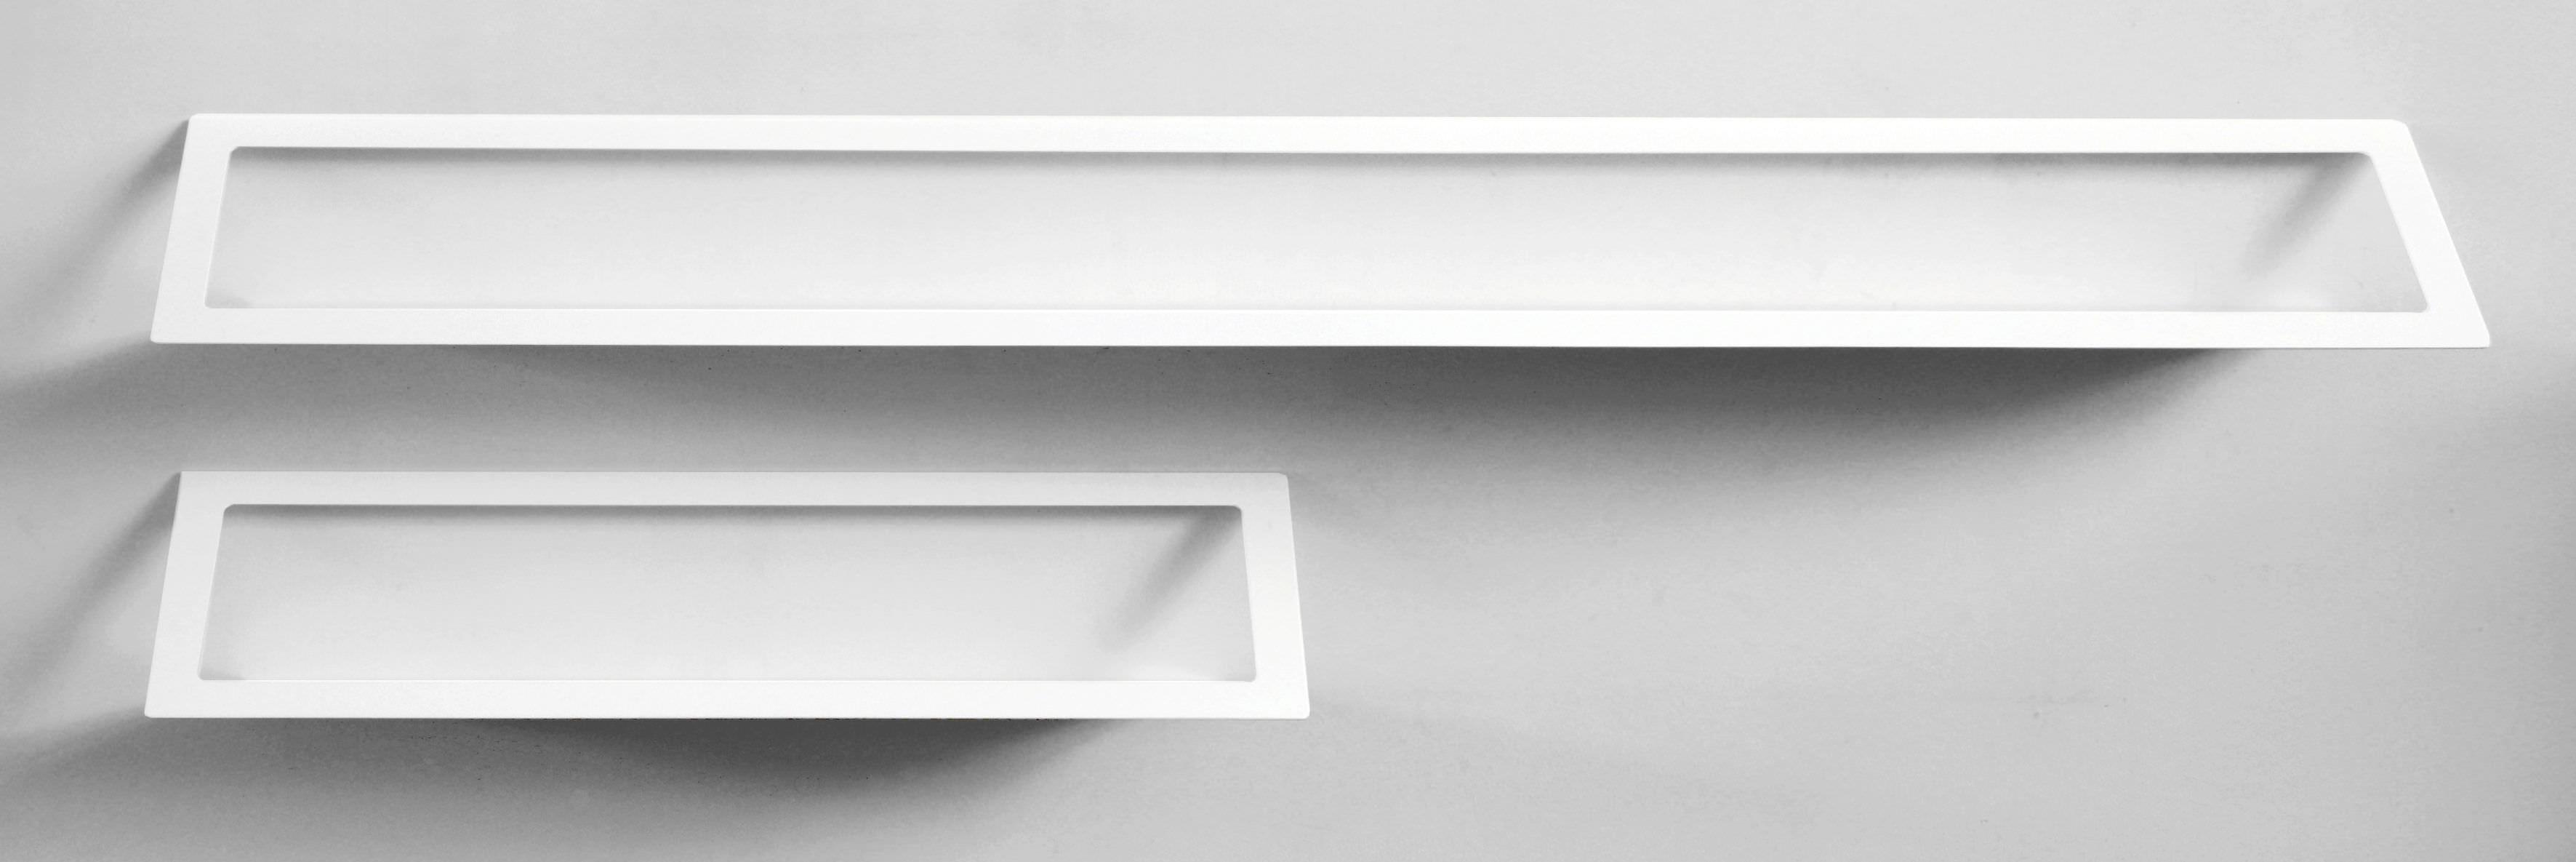 Fullsize Of Modern Metal Wall Shelf